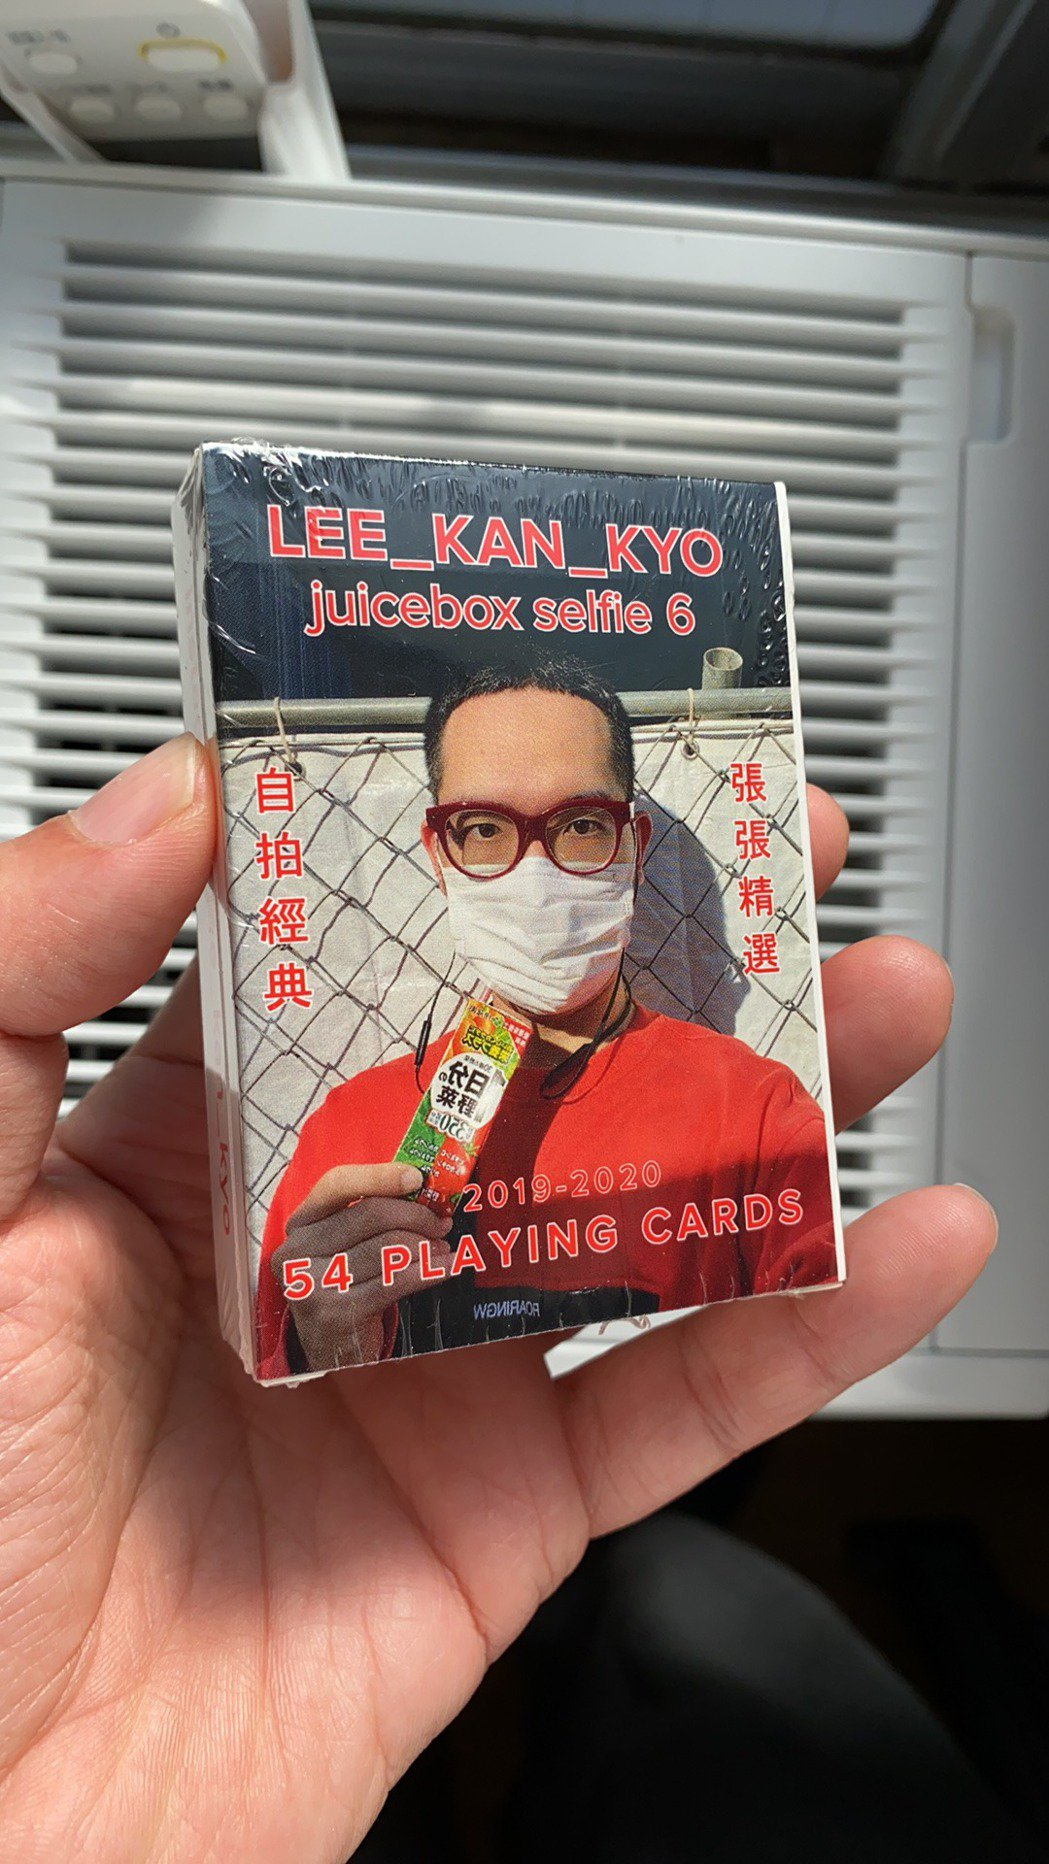 Juicebox Selfie #6撲克牌,以年為單位發行。圖/朋丁提供